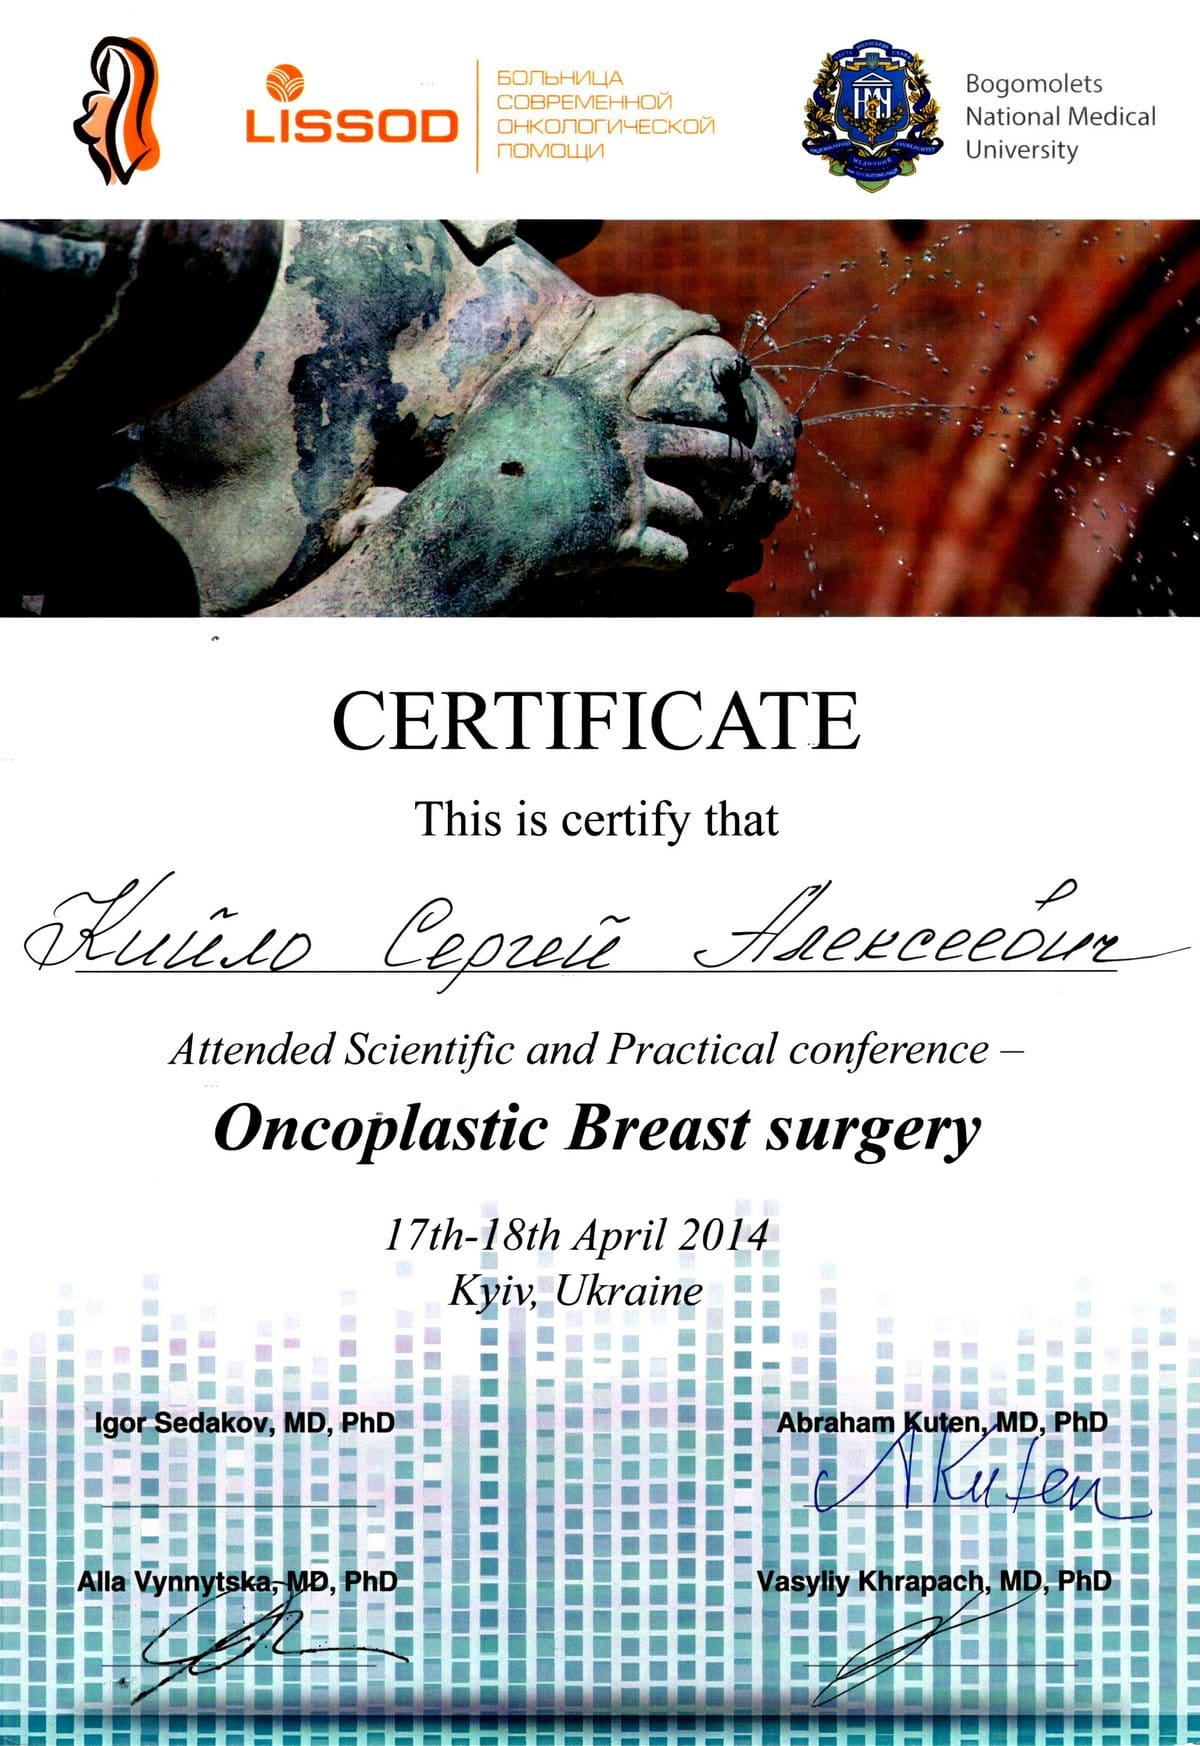 Документ №:5 Сертификат пластического хирурга Кийло Сергея Алексеевича